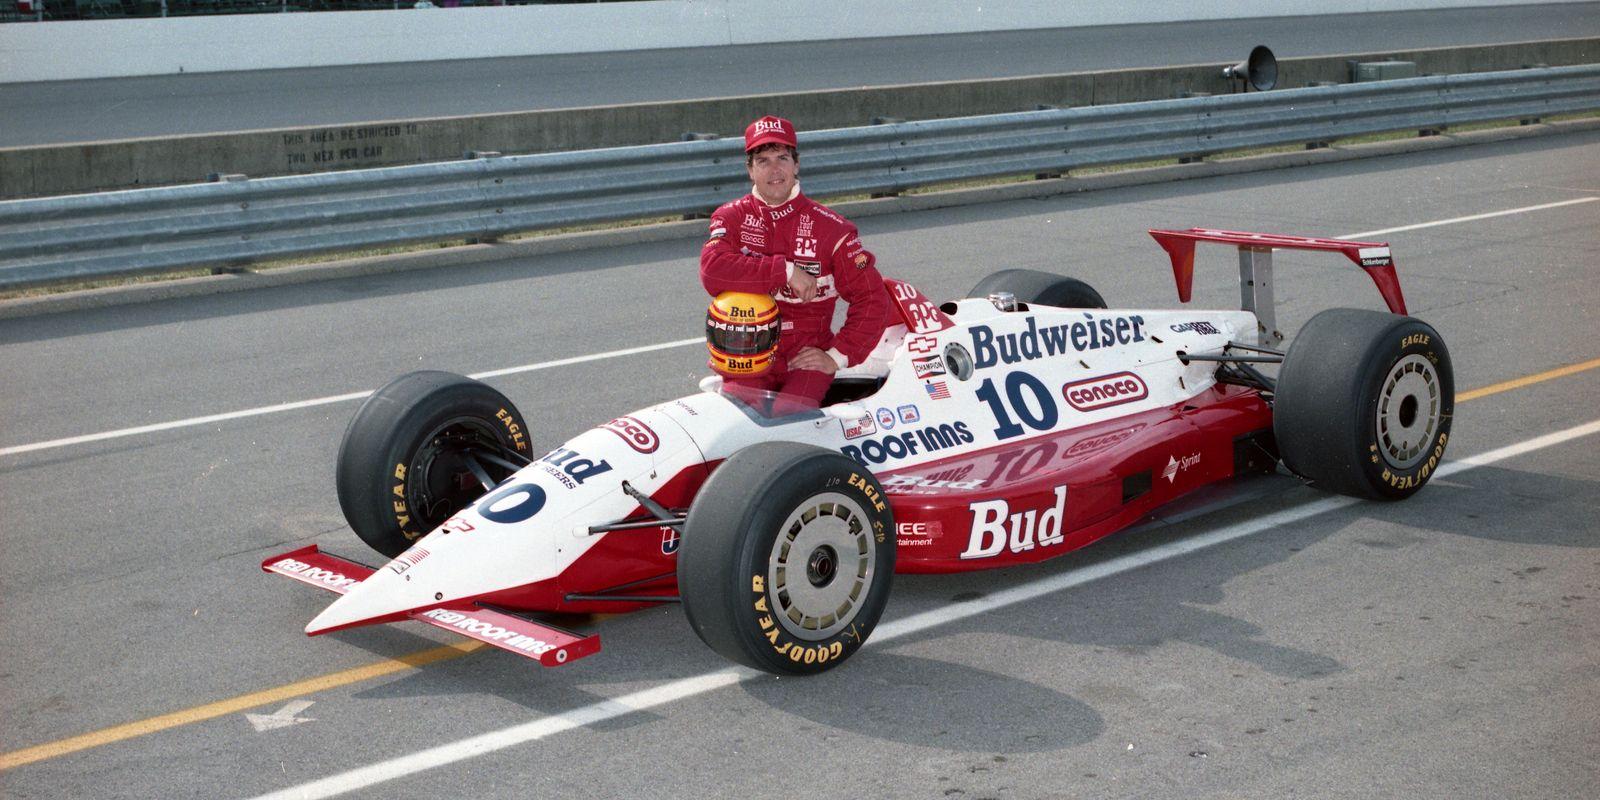 A J FOYT 1991 LOLA CHEVROLET INDY 500 AUTO RACING 8X10 PHOTO #2